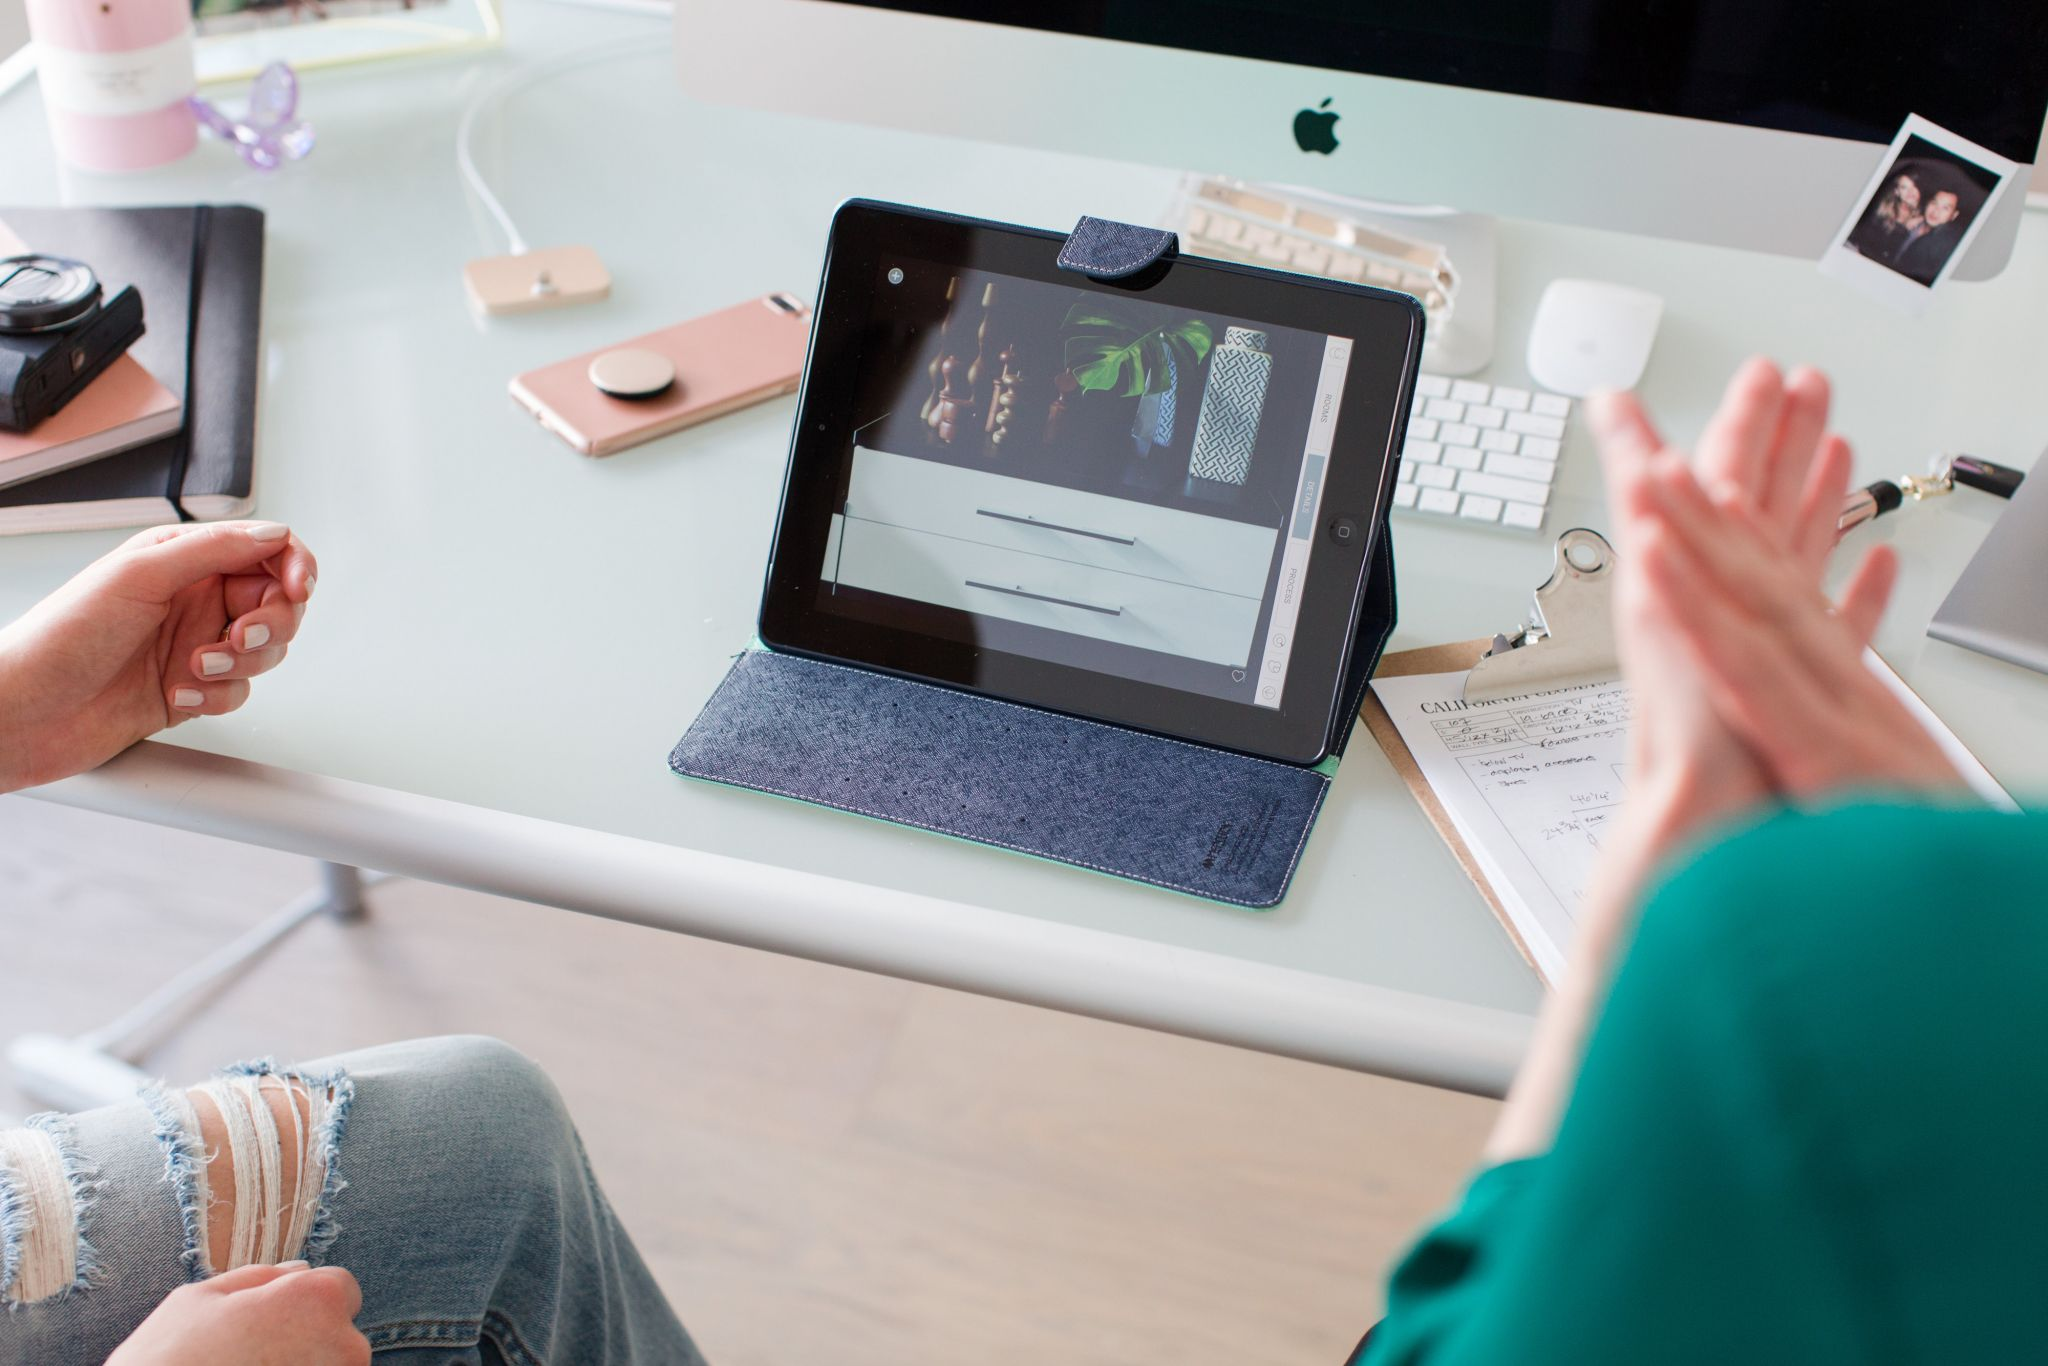 California closets design consultation, iPad with closet photo on screen